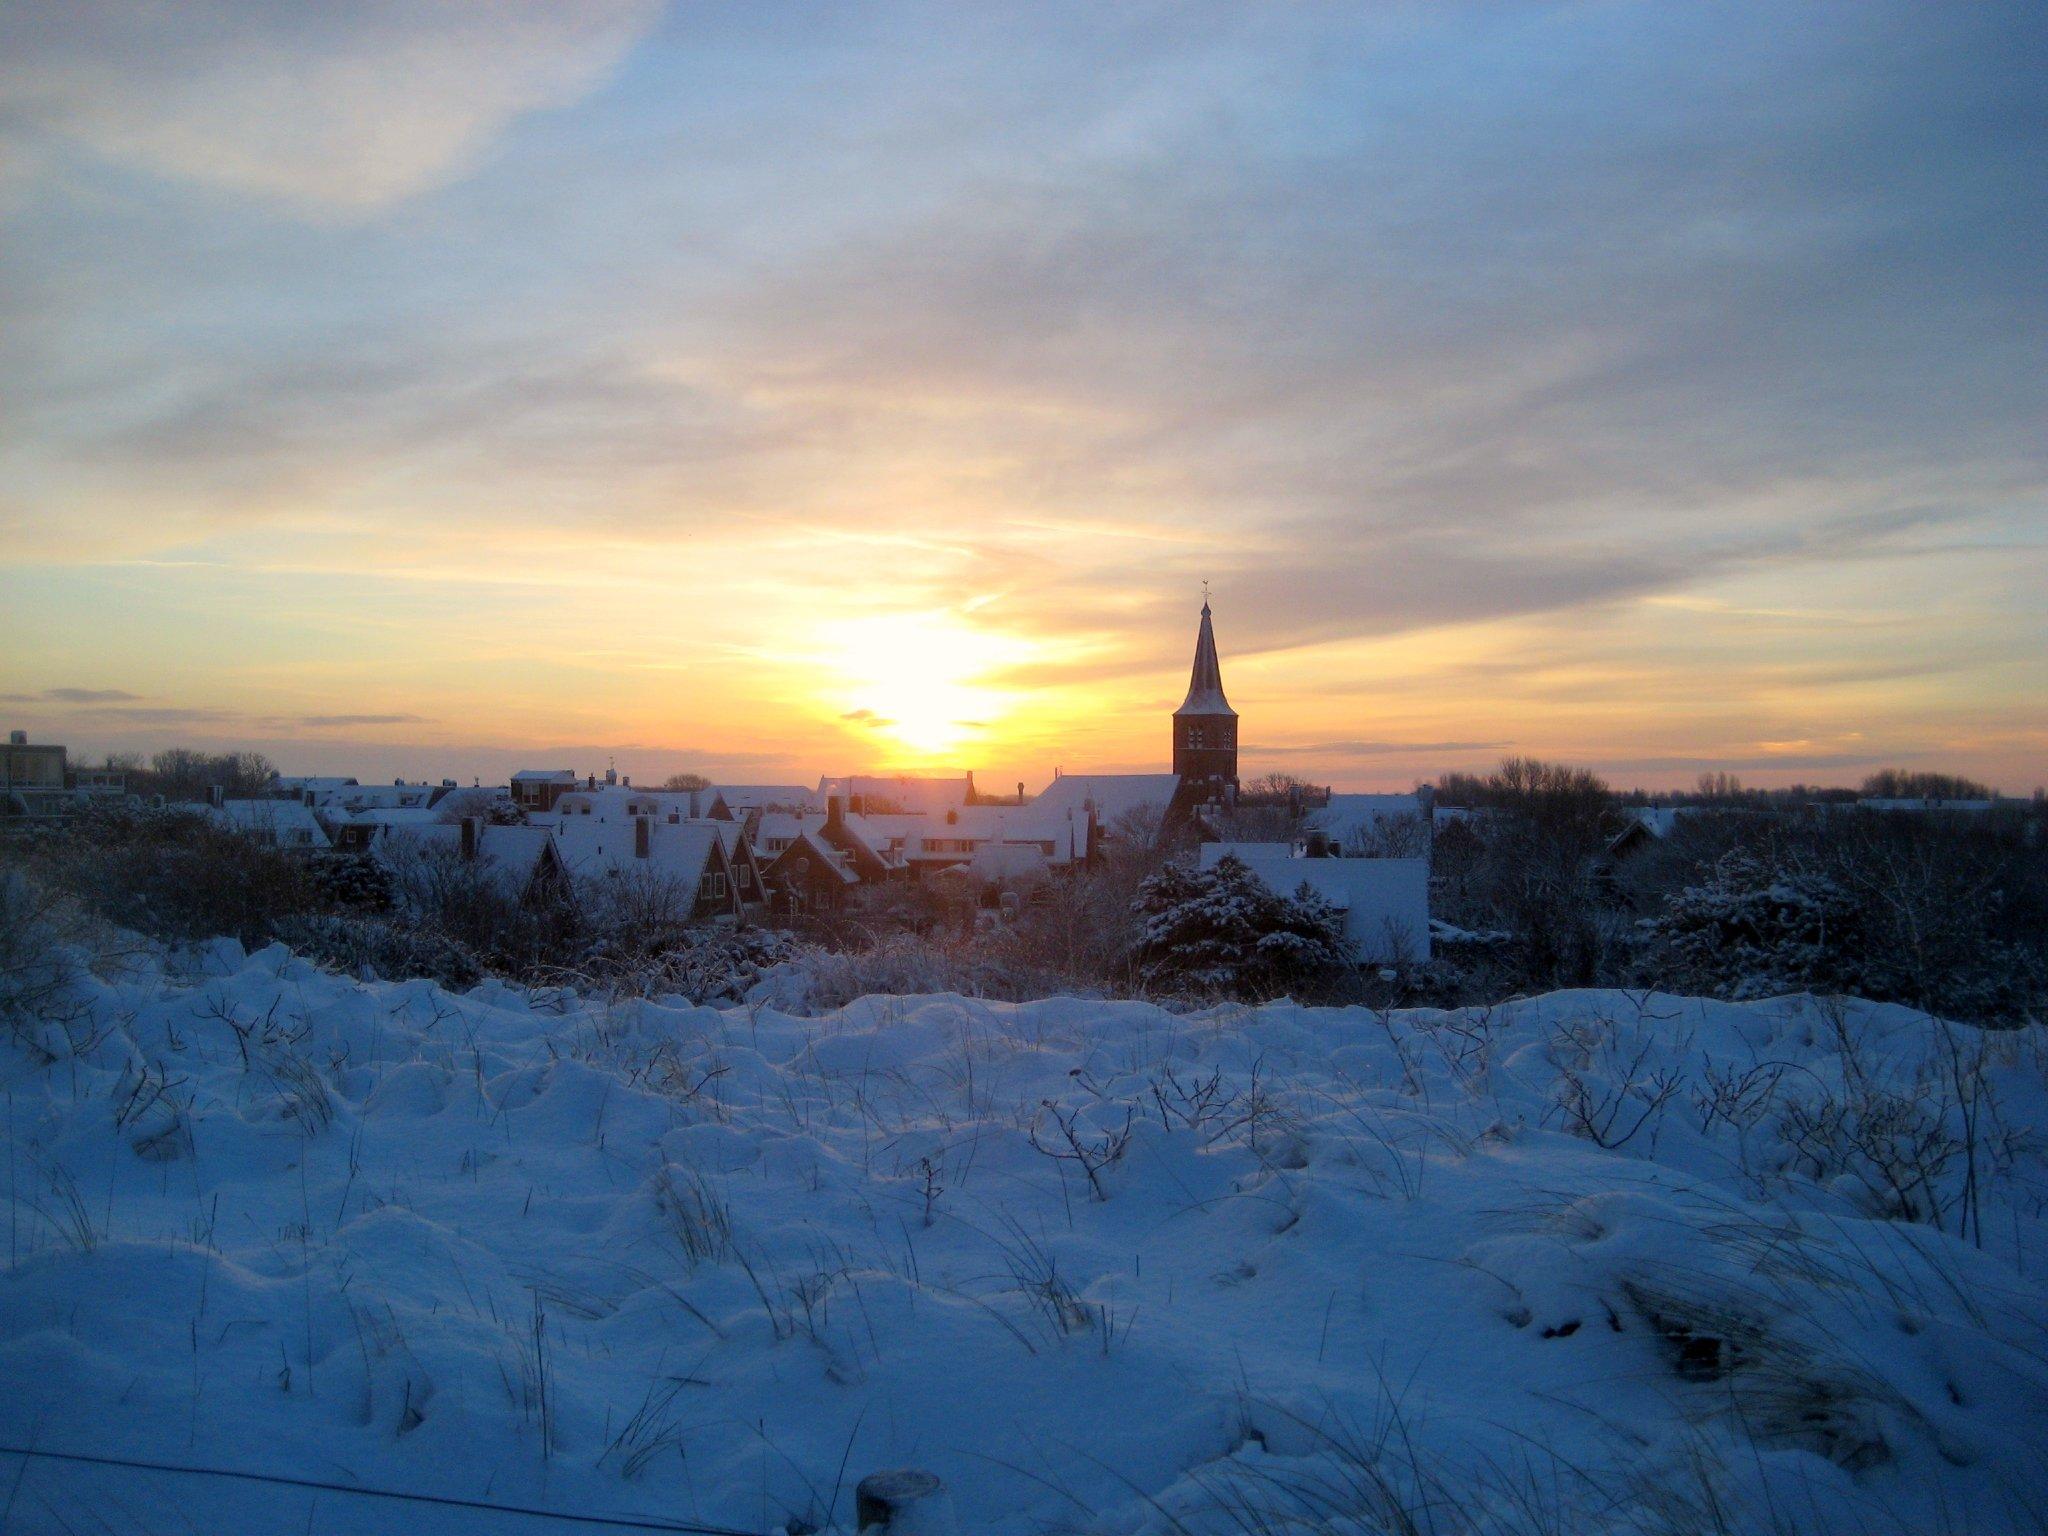 Domburg in Winter